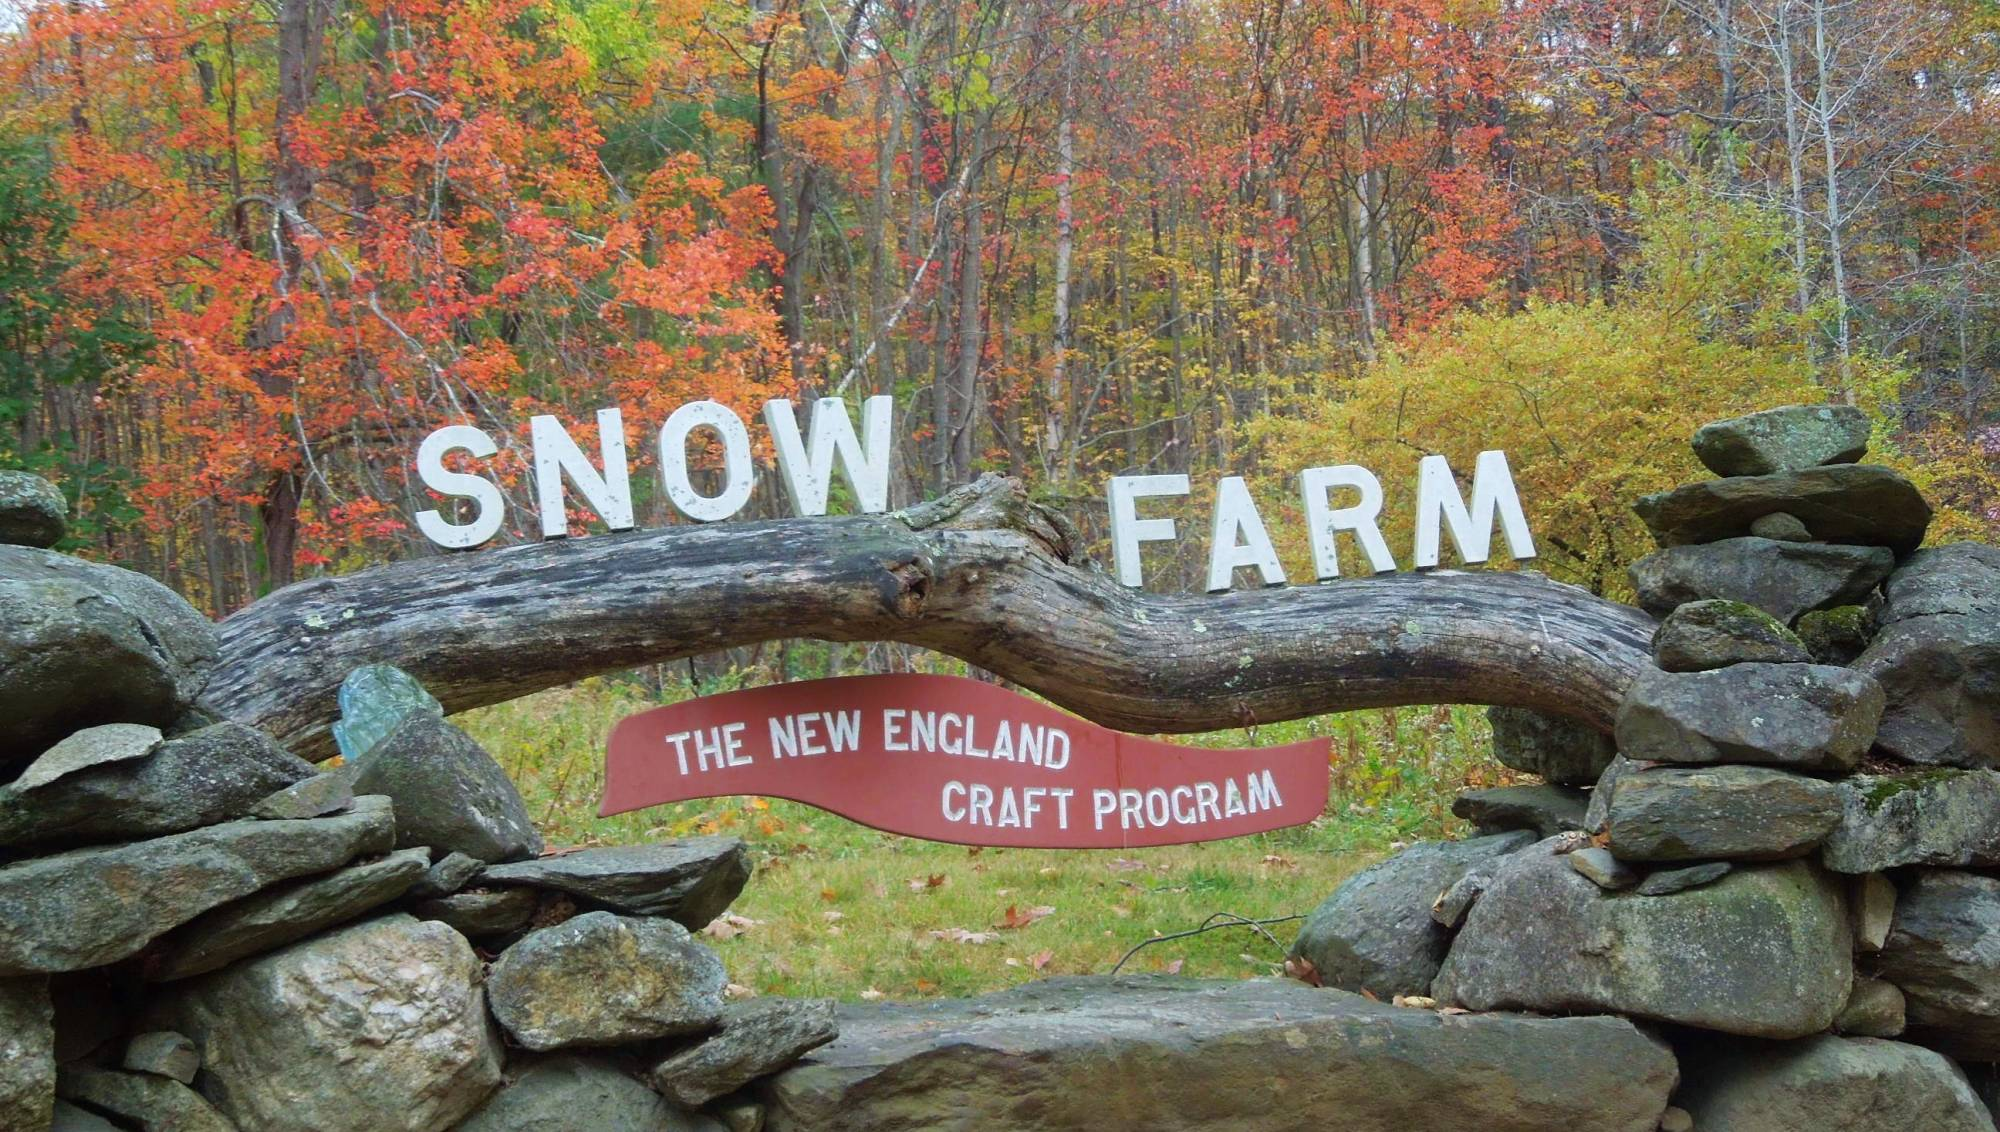 new england fall, new england autumn, historic new england farms, snow farm, craft school